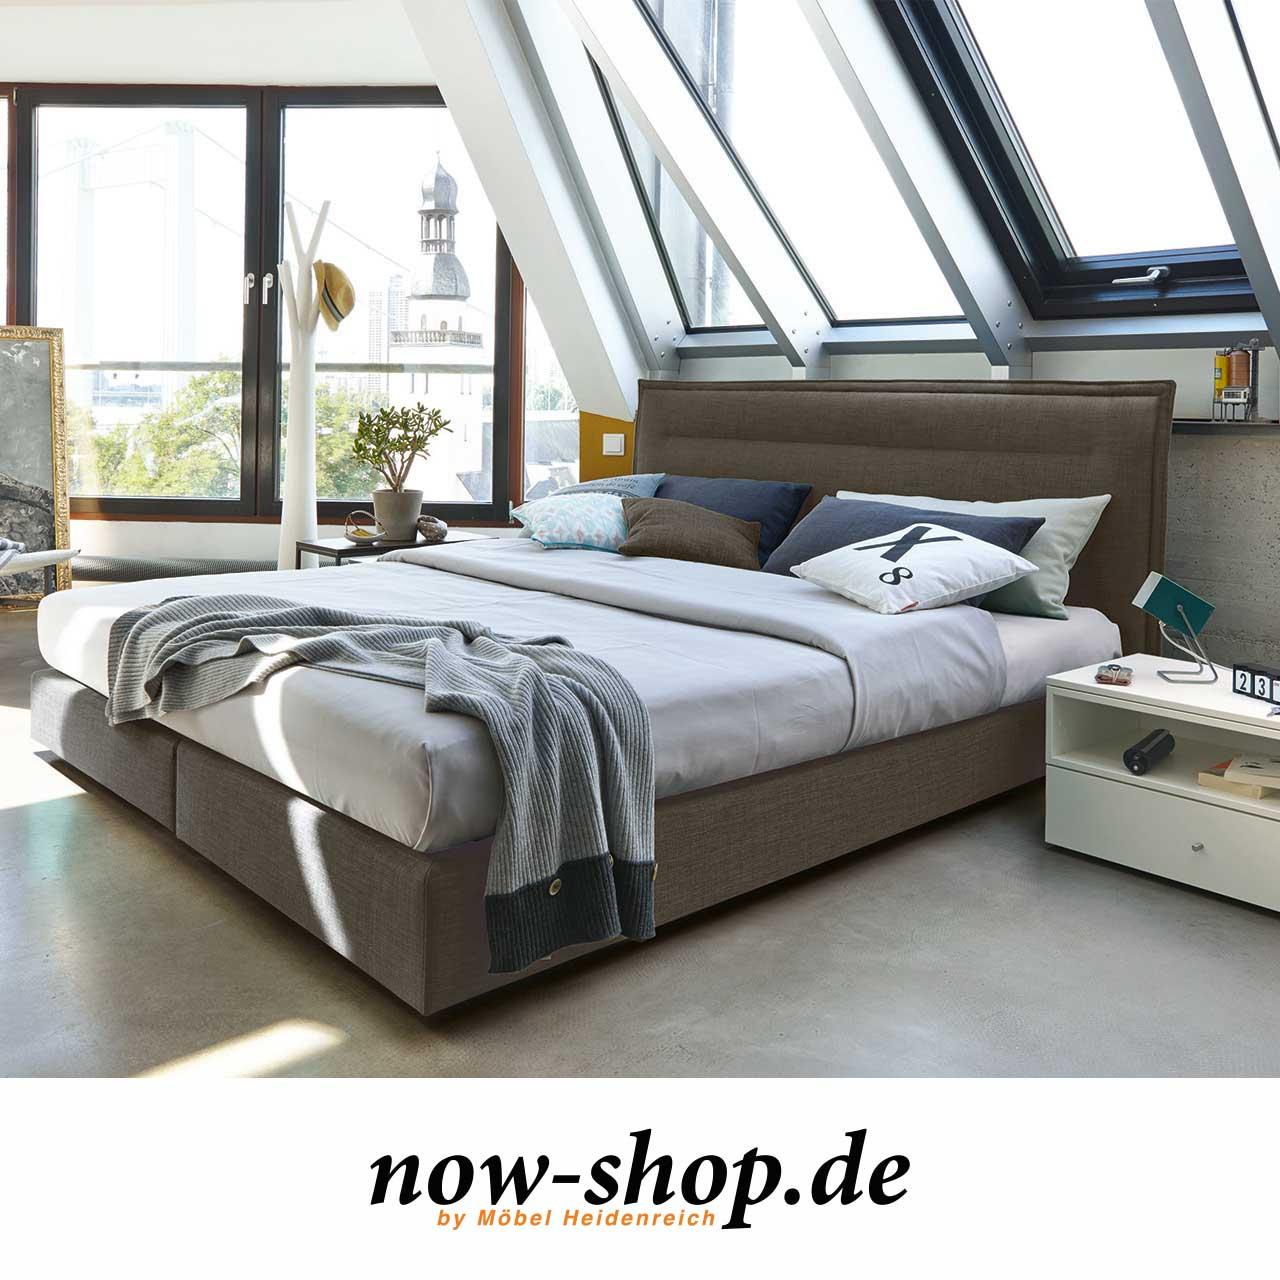 Now By Hülsta Boxspringbett C Now Shop